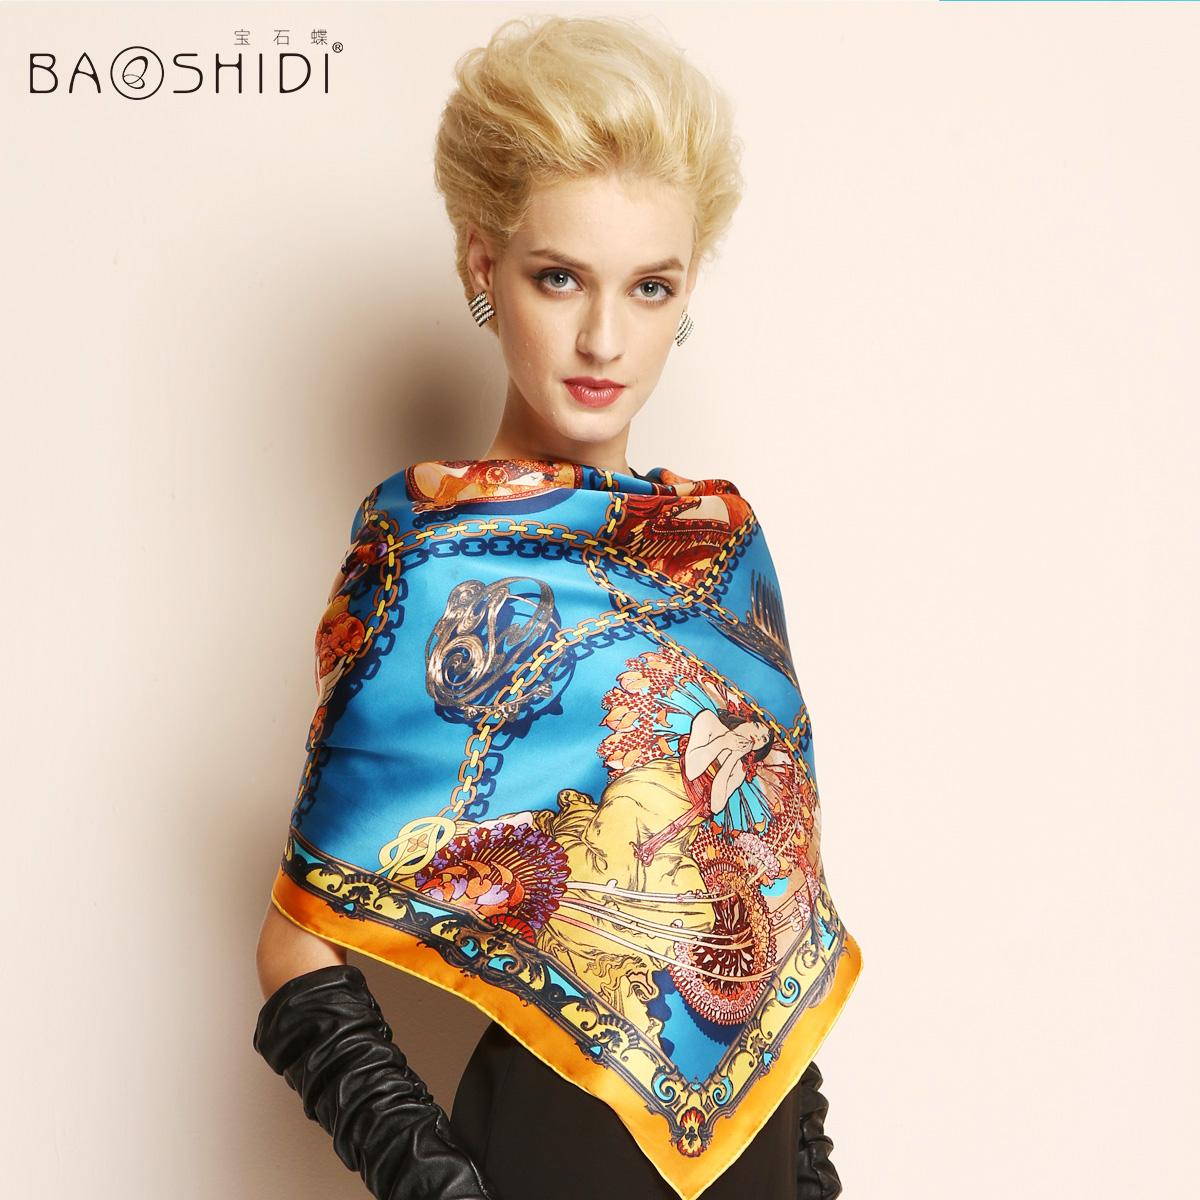 90*90CM Pteroic gem silk large facecloth female silk scarf mulberry silk scarfОдежда и ак�е��уары<br><br><br>Aliexpress